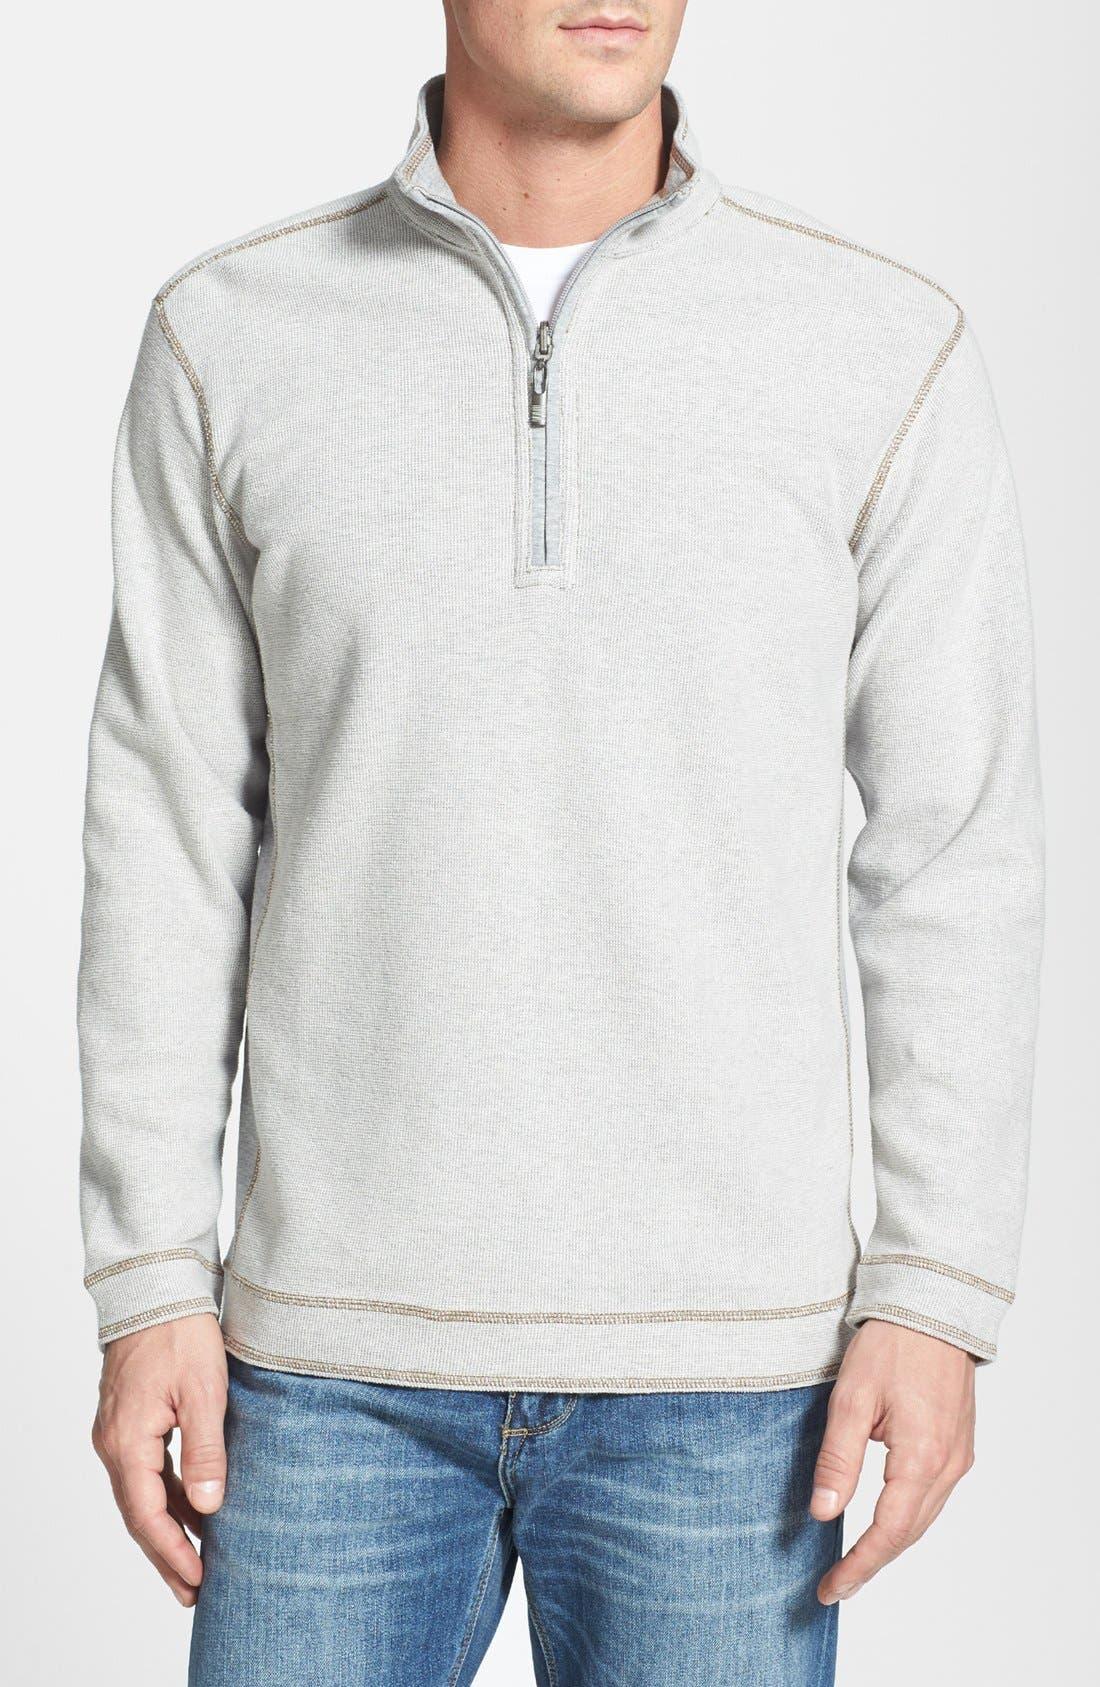 Alternate Image 1 Selected - Tommy Bahama Denim 'Grand Isles' Reversible Half Zip Sweatshirt